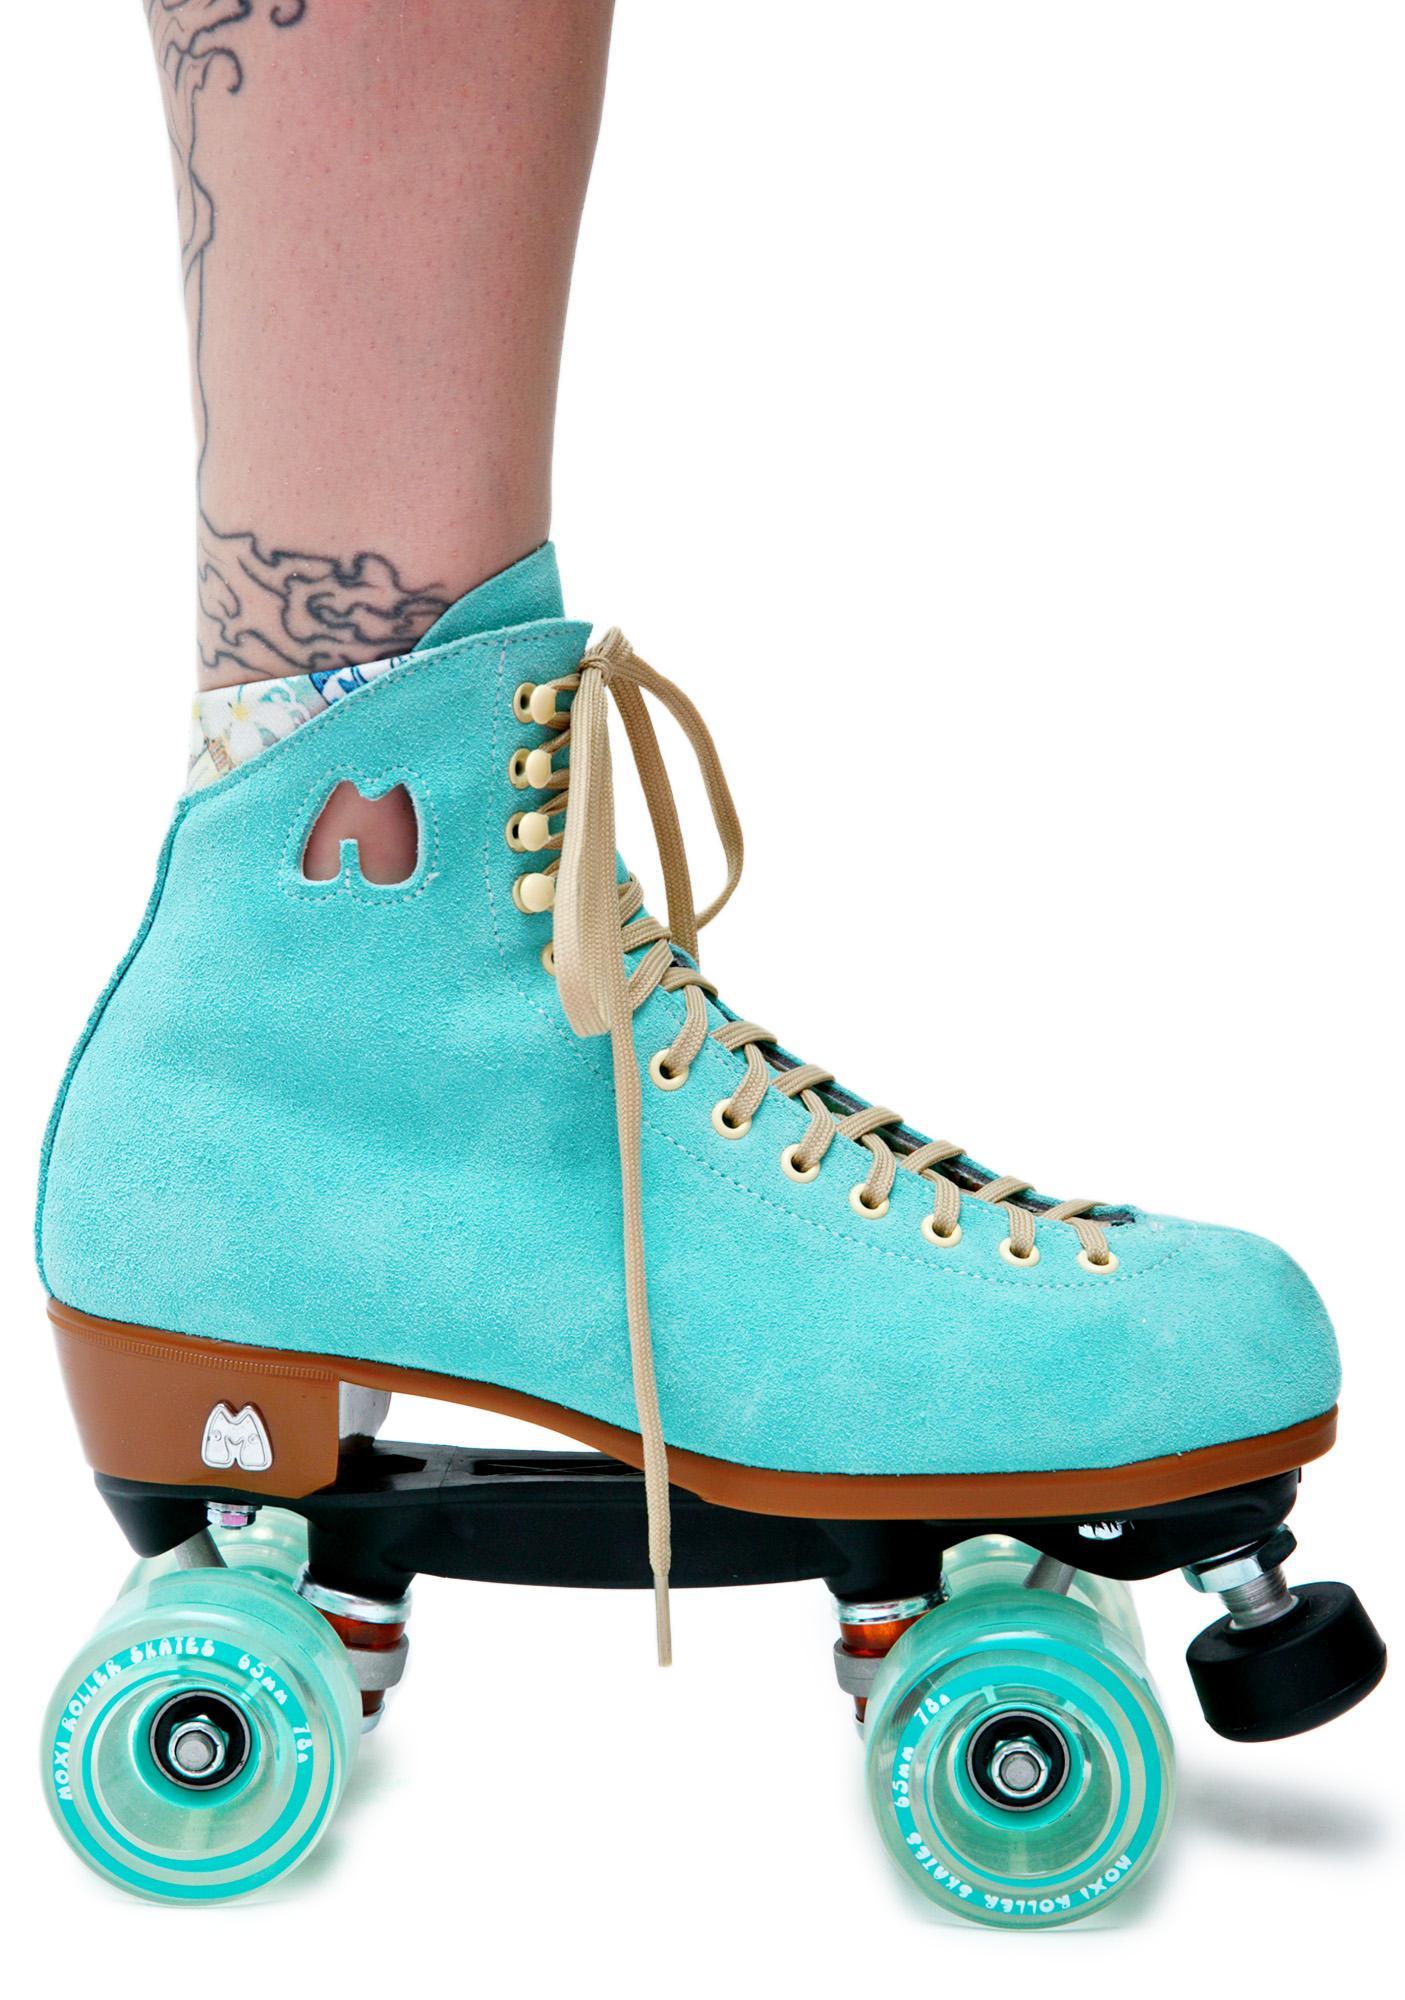 Moxi Roller Skates Floss Lolly Roller Skates